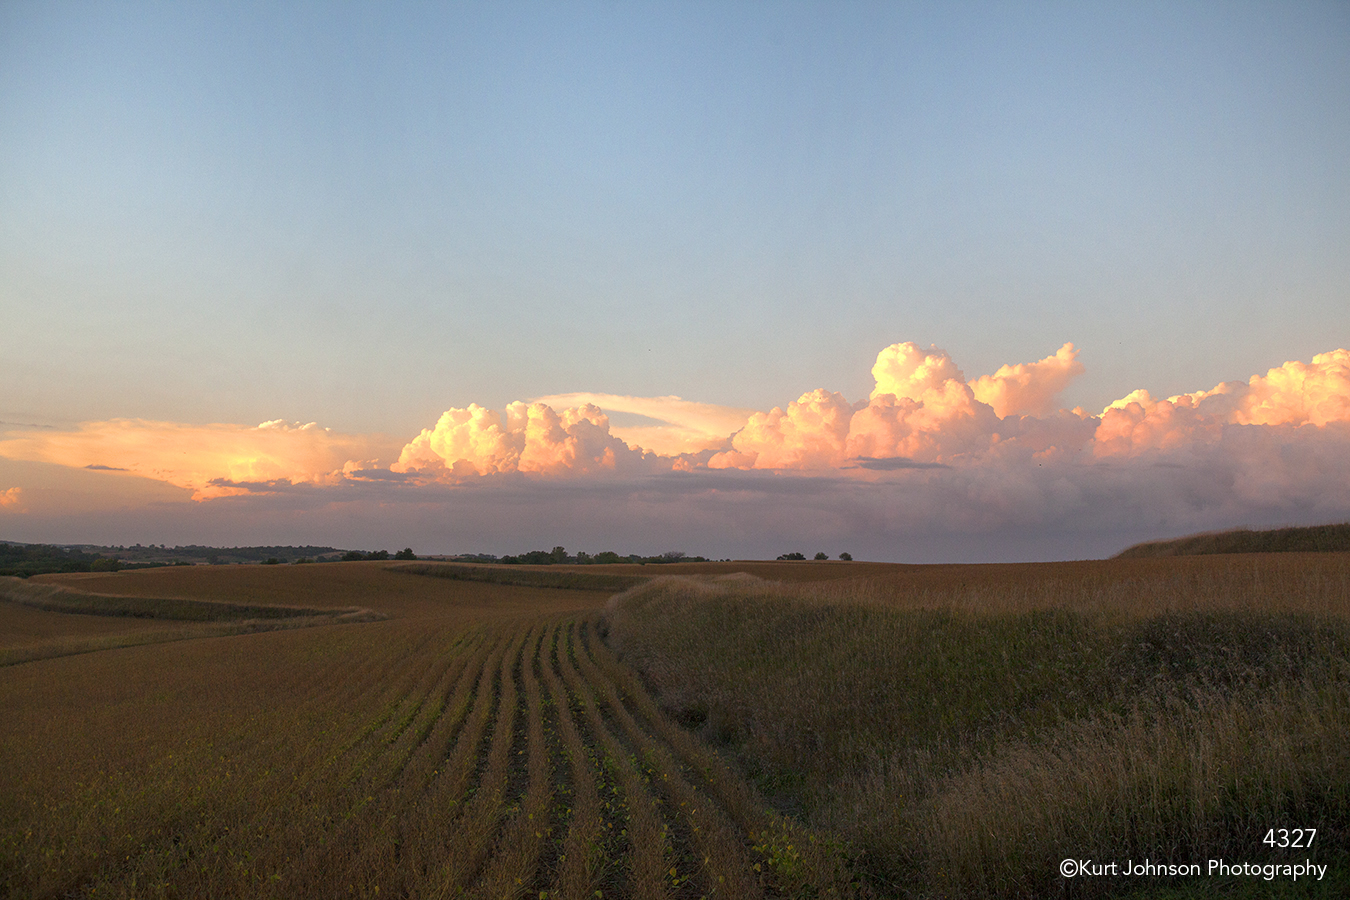 landscape grasses clouds sunset midwest fields crops